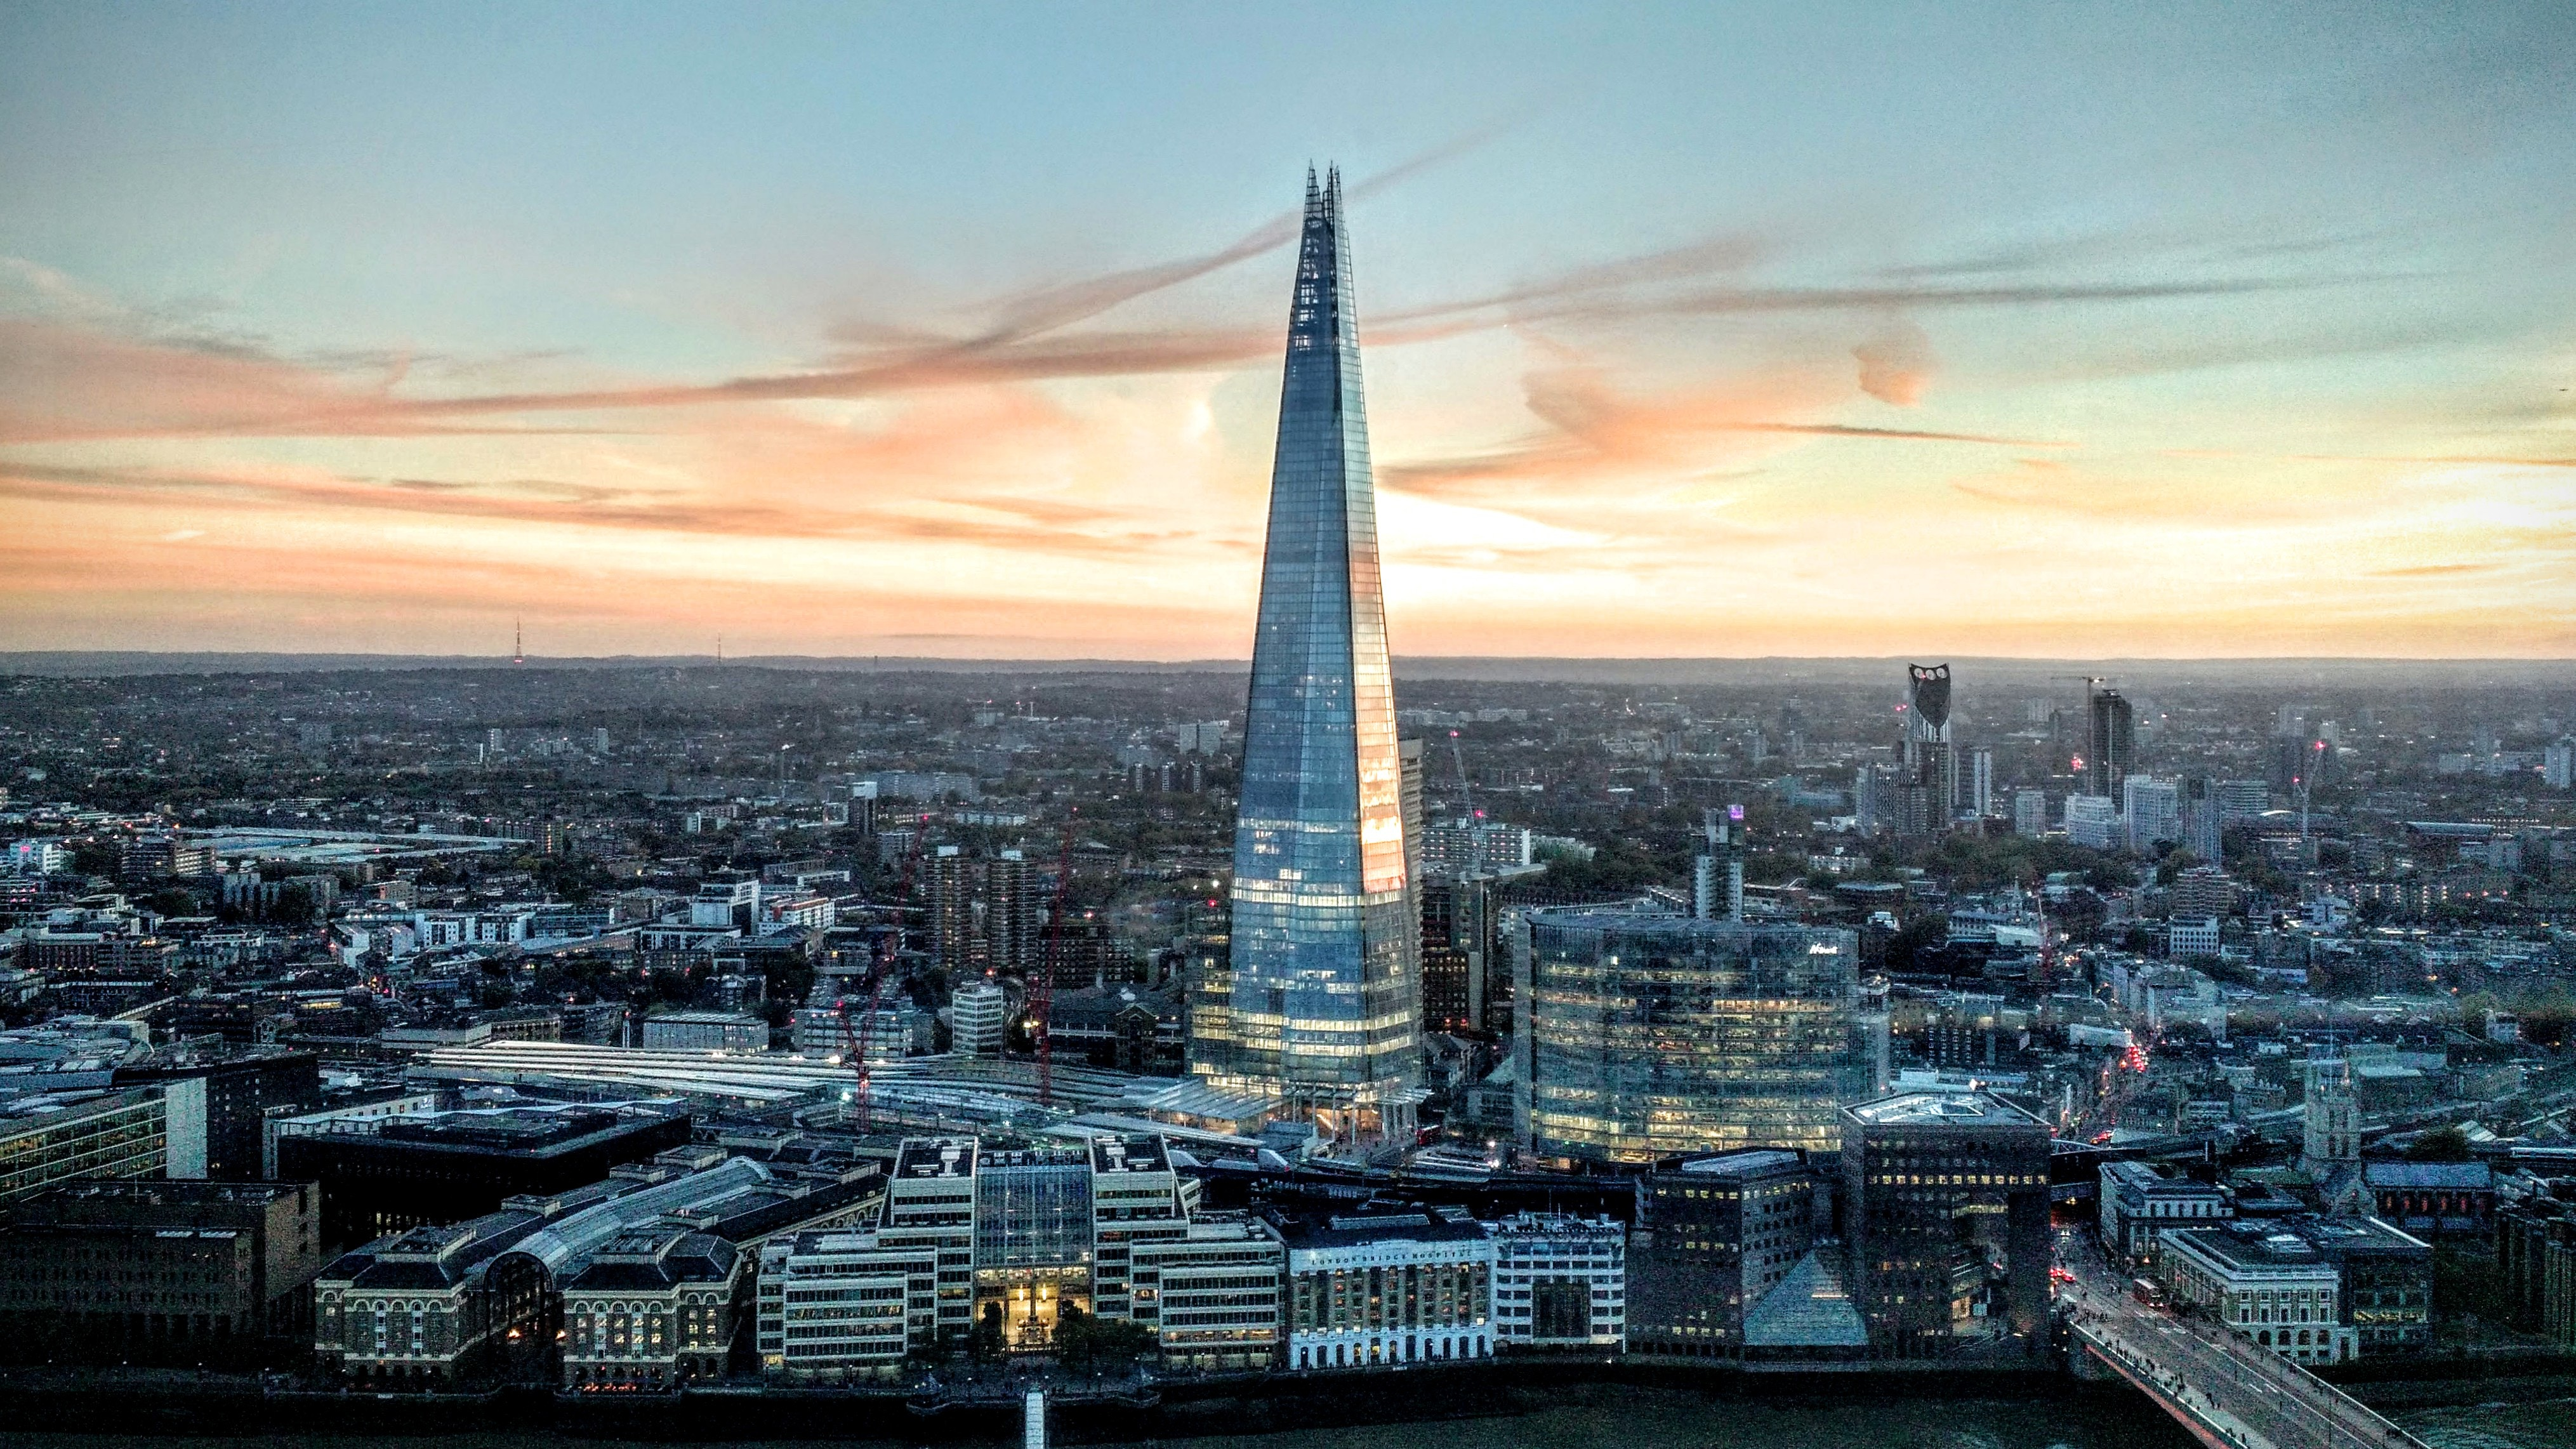 investment banking praktikum london erfahrungsbericht